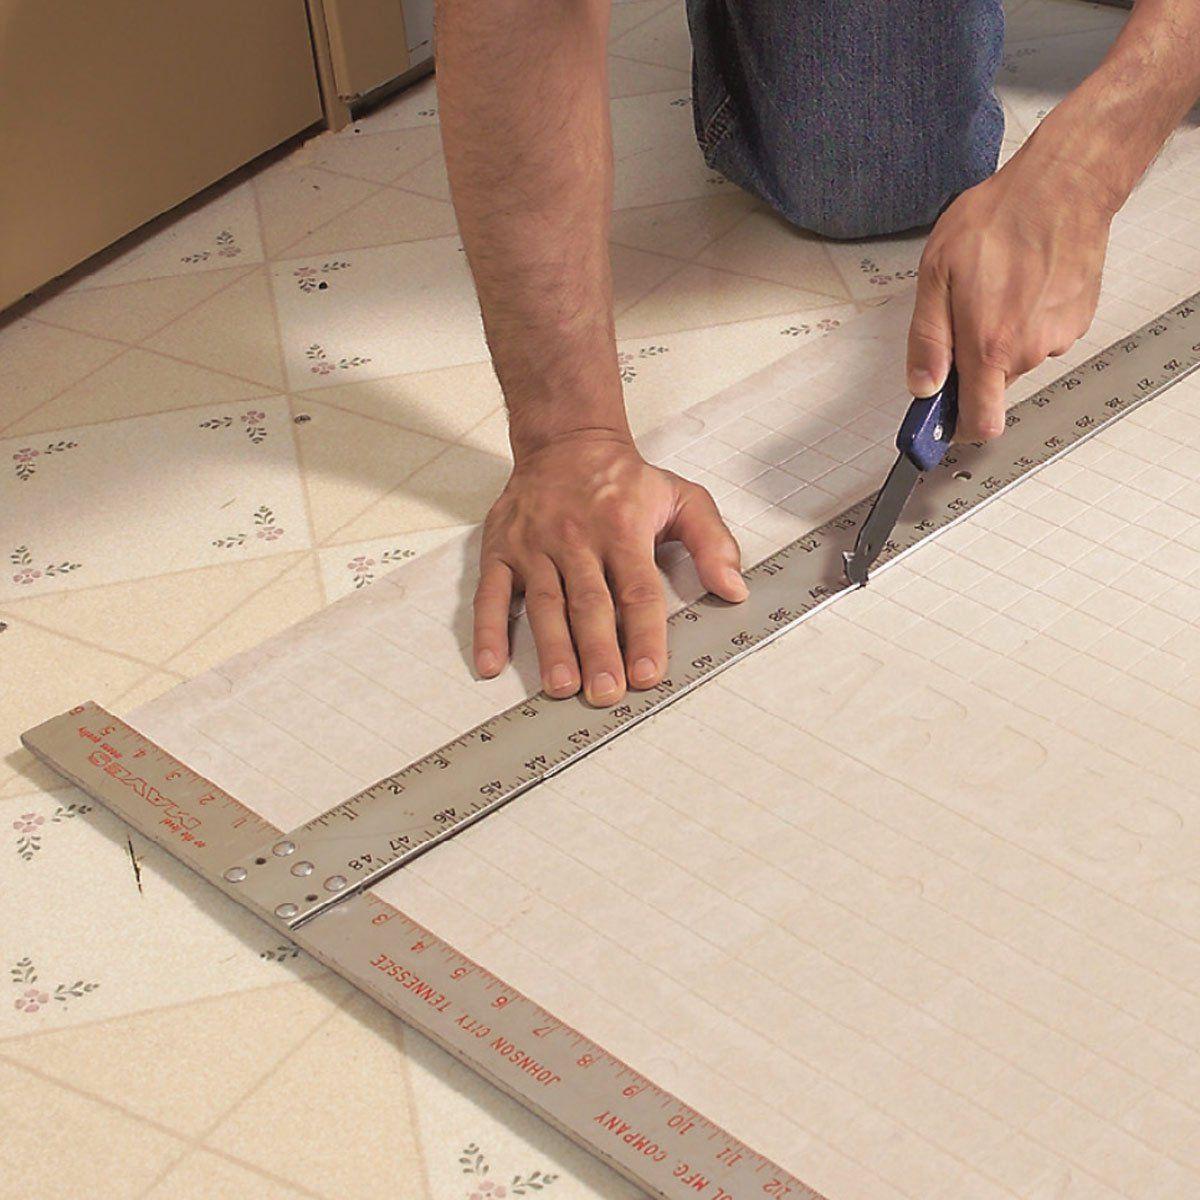 How To Install Ceramic Tile Floor In The Bathroom Ceramic Floor Tiles Tile Floor Installing Tile Floor